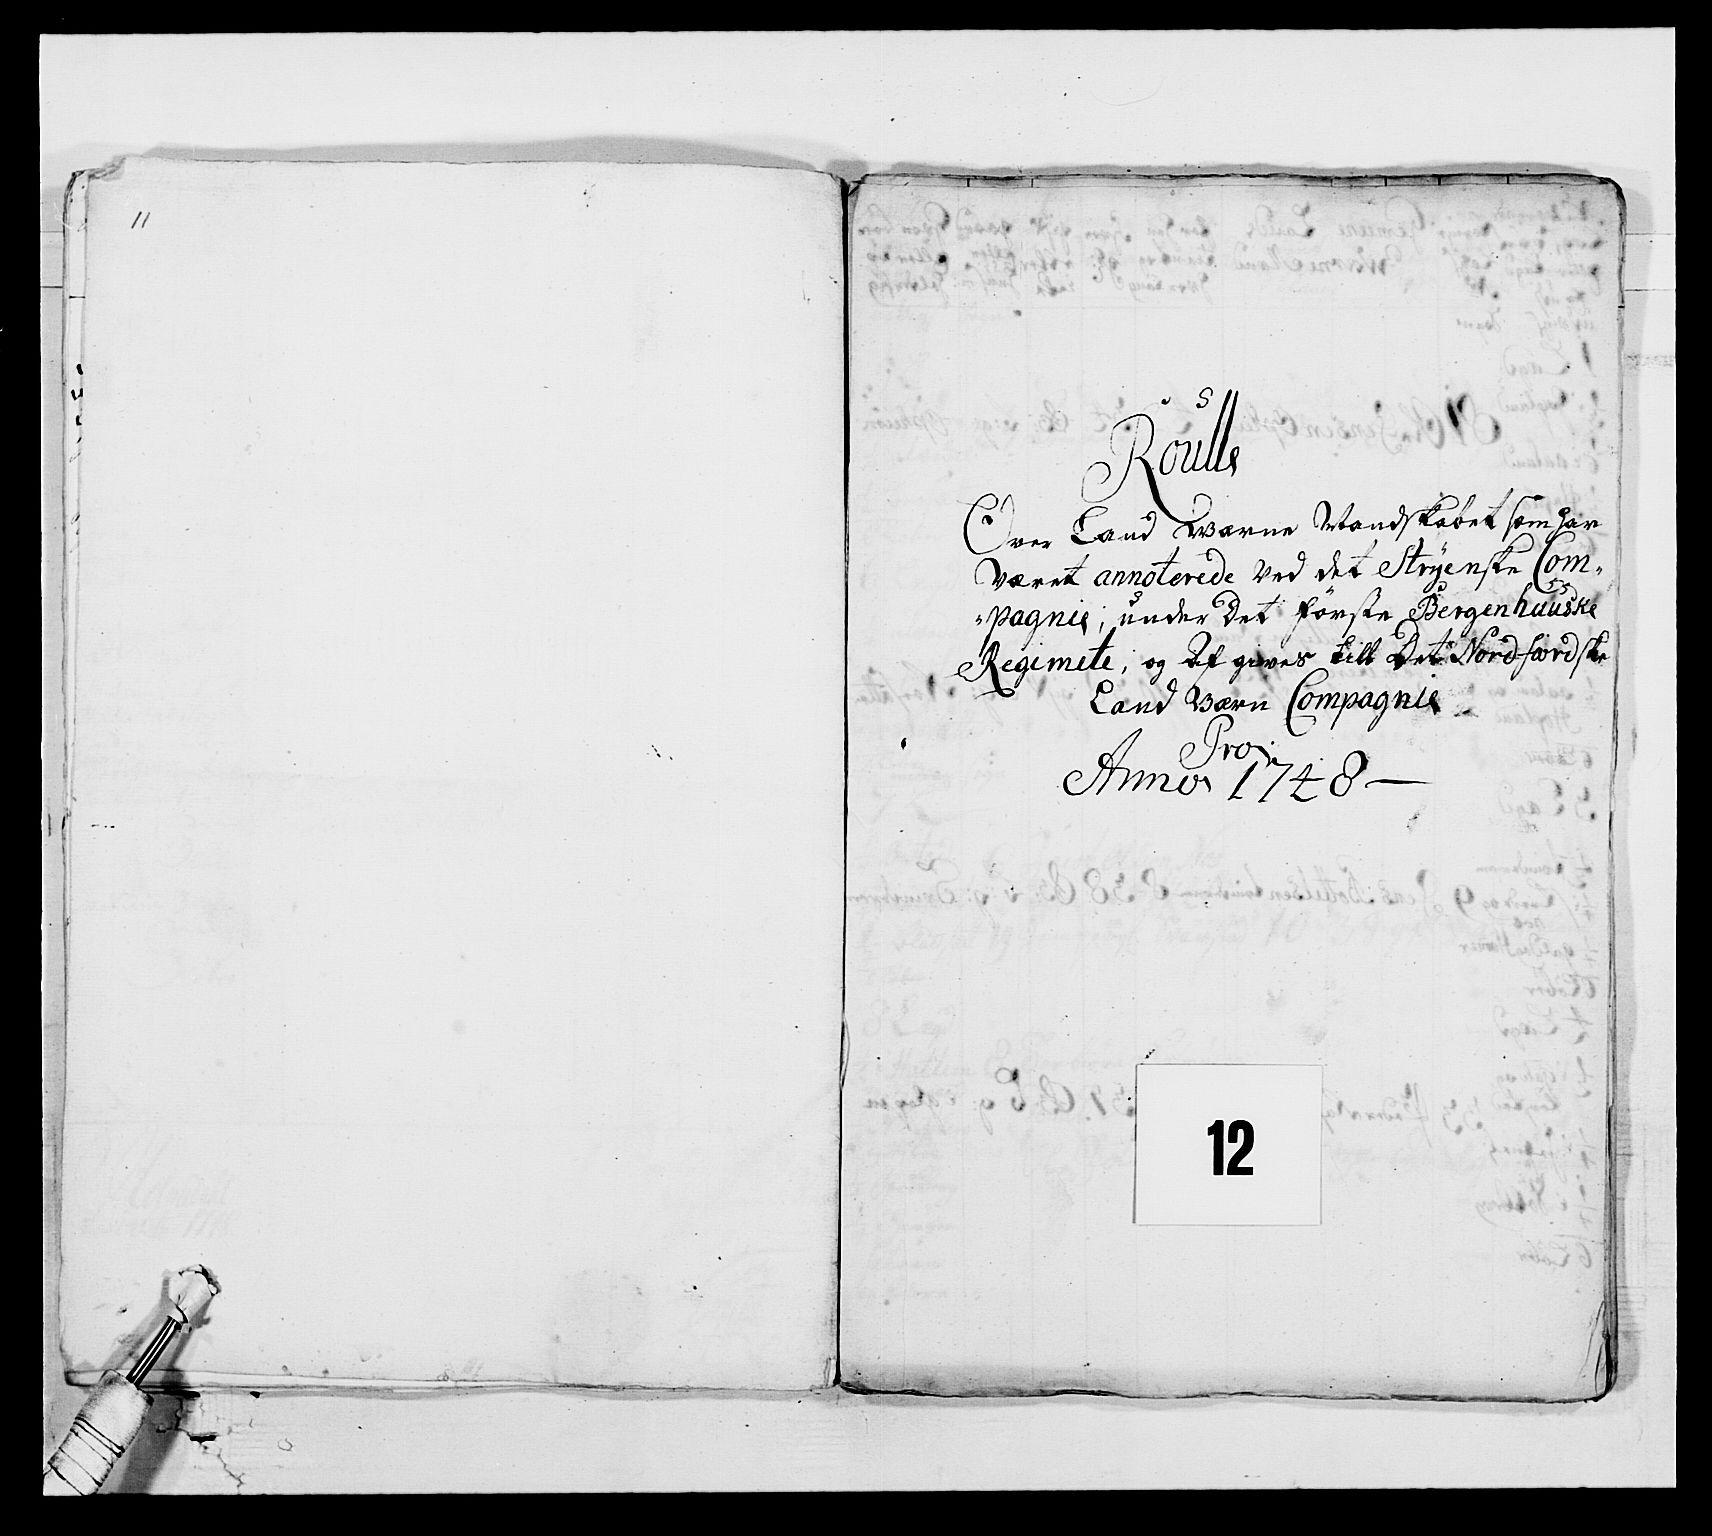 RA, Kommanderende general (KG I) med Det norske krigsdirektorium, E/Ea/L0517: 1. Bergenhusiske regiment, 1742-1756, s. 95